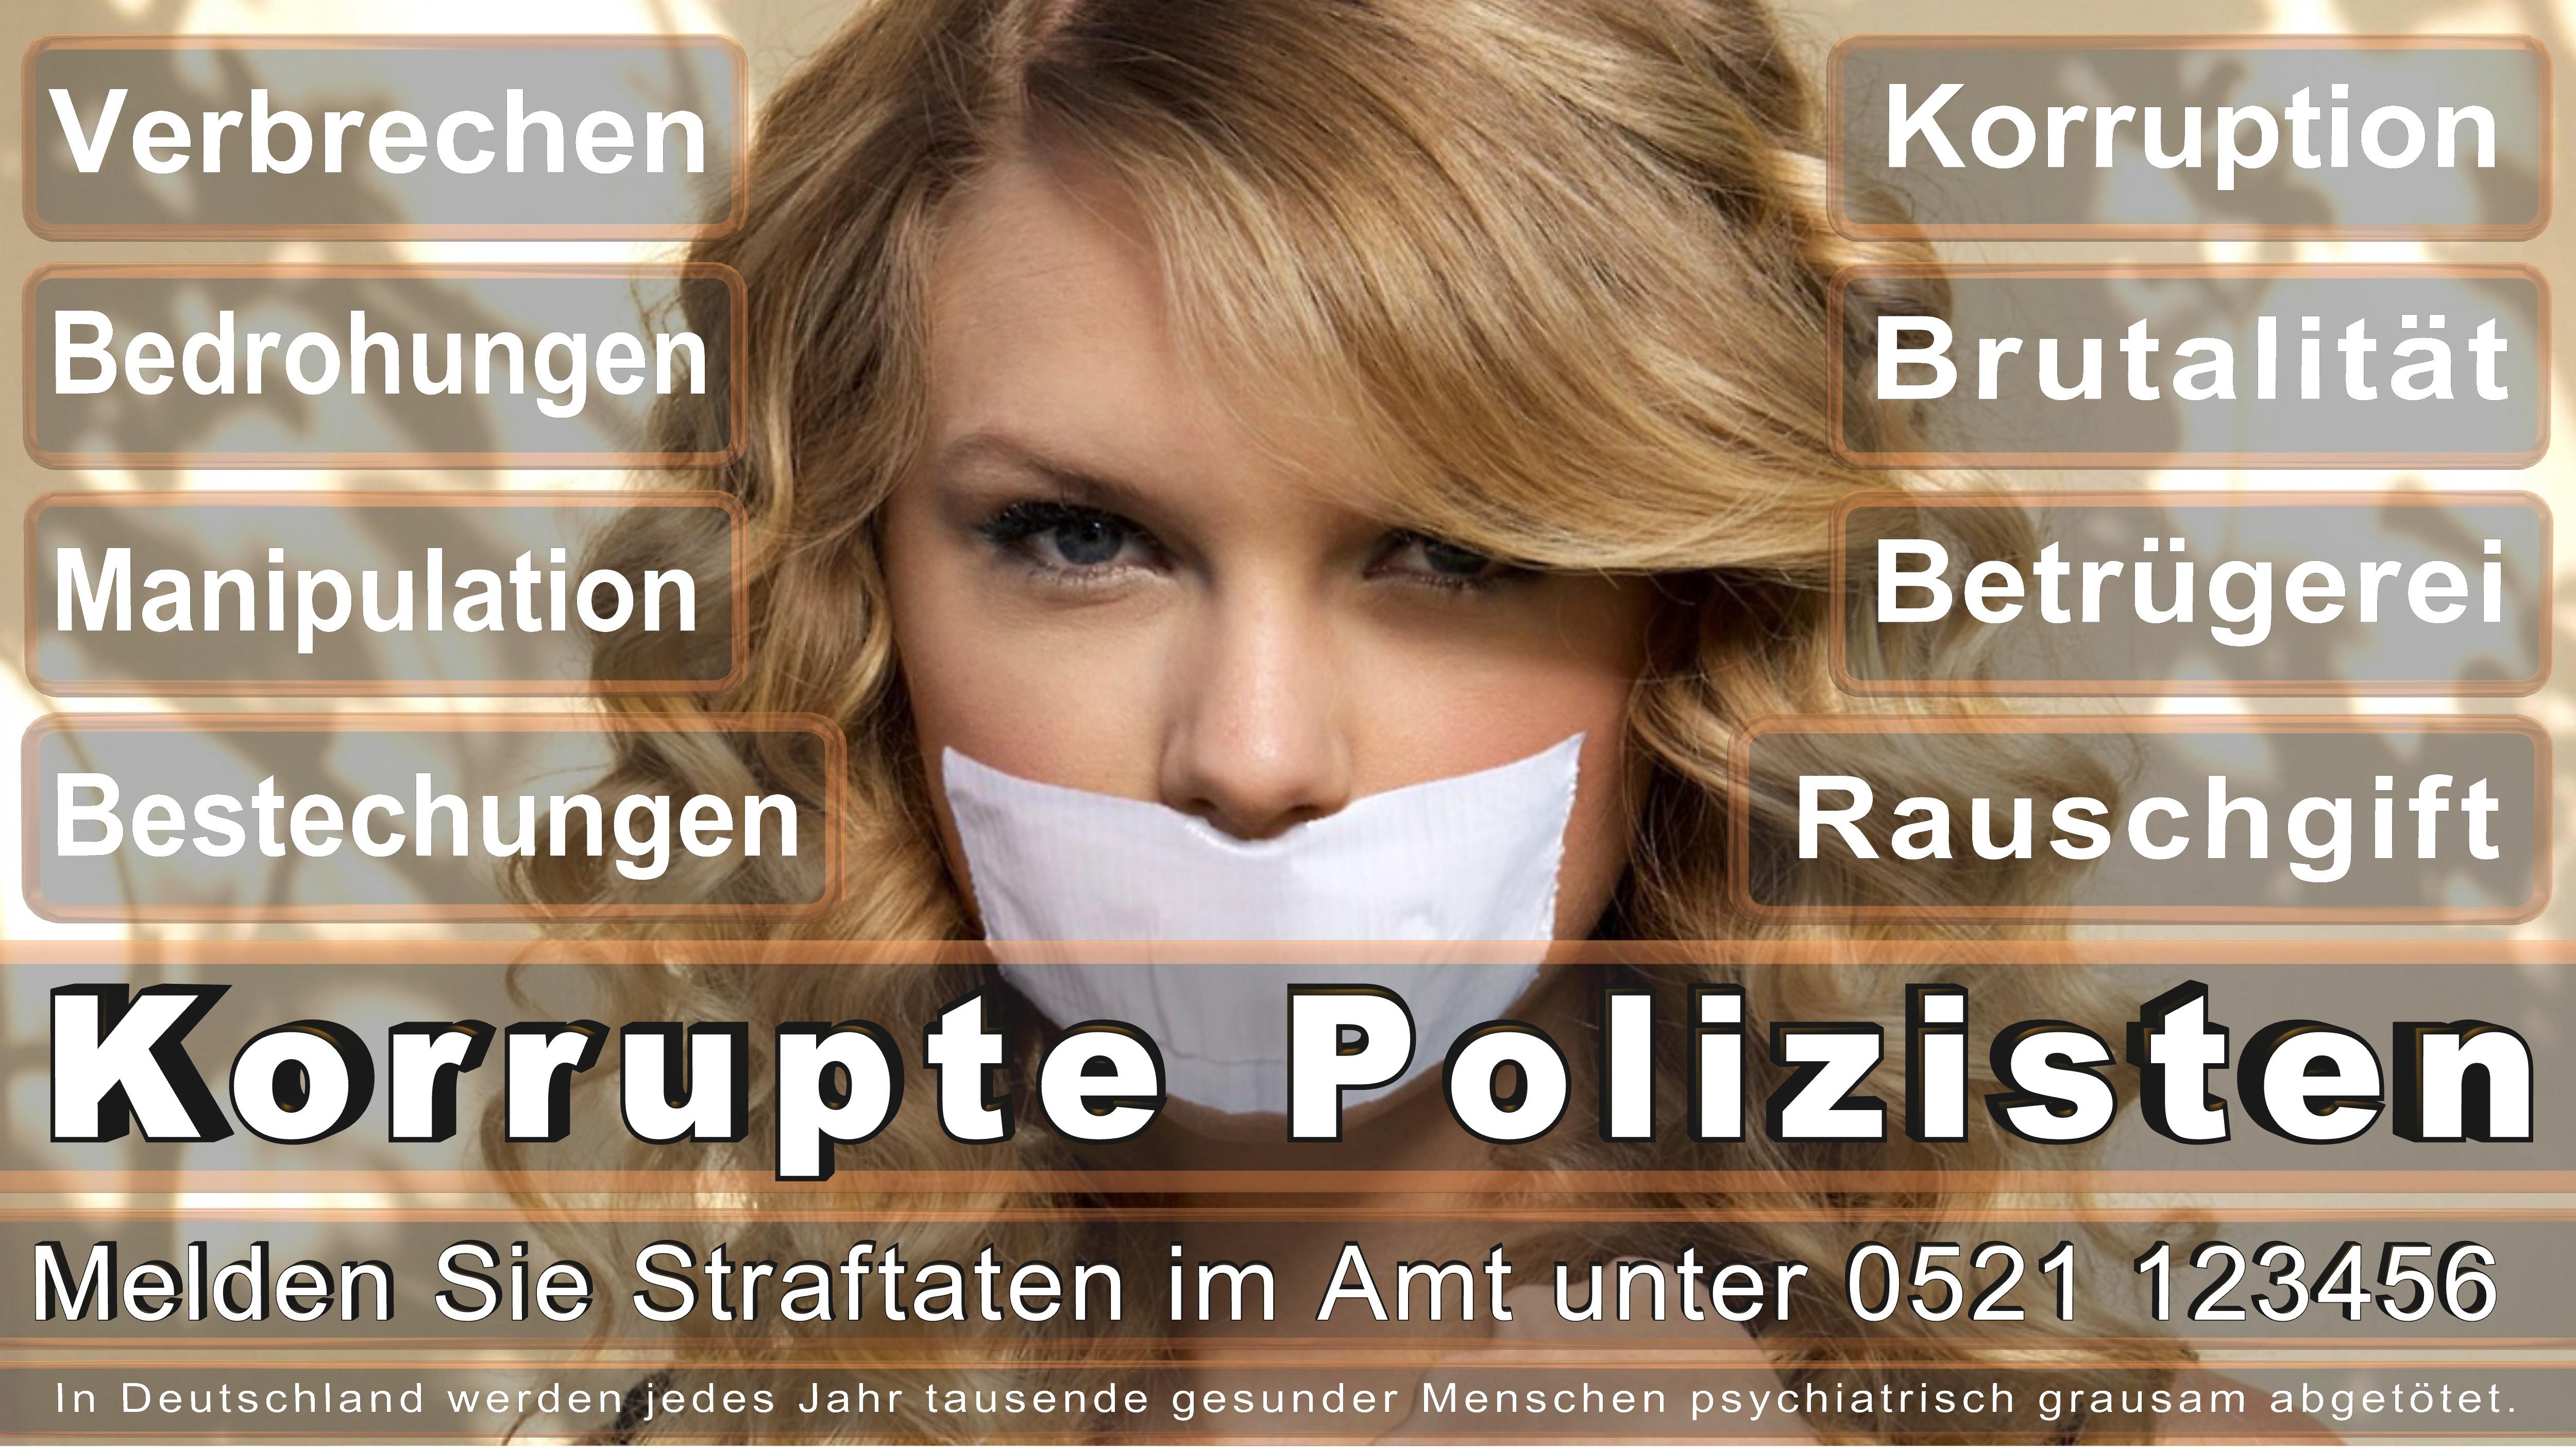 Polizei-Bielefeld-Polizei-Bielefeld-Polizei-Bielefeld (210)